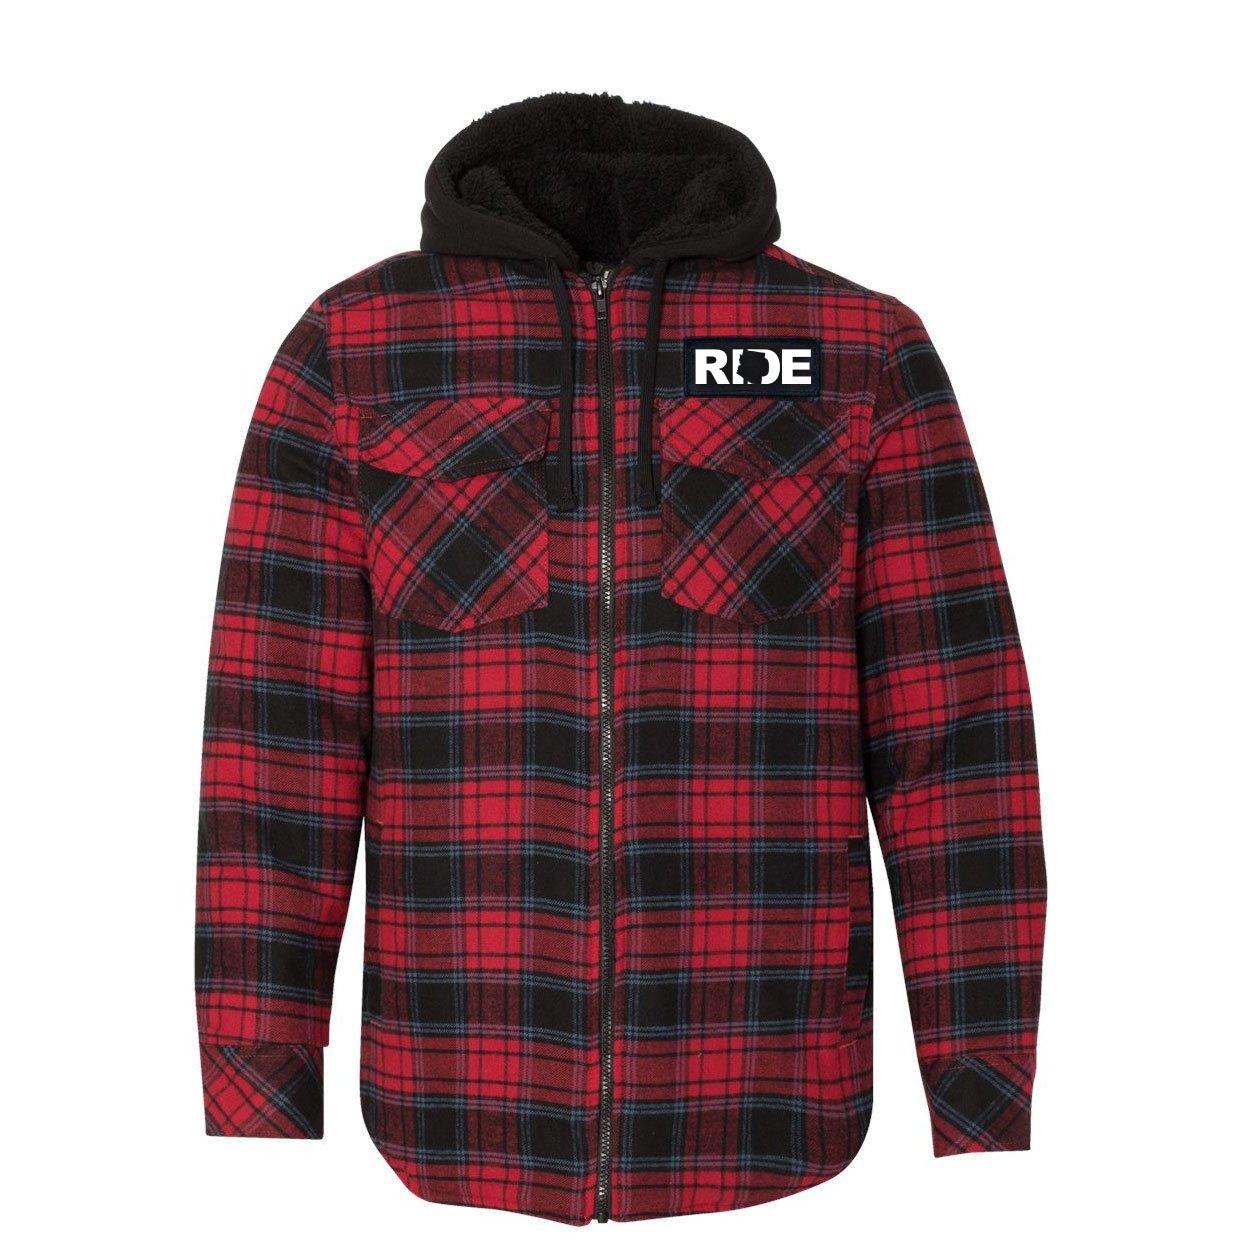 Ride Arizona Classic Unisex Full Zip Woven Patch Hooded Flannel Jacket Red/Black Buffalo (White Logo)